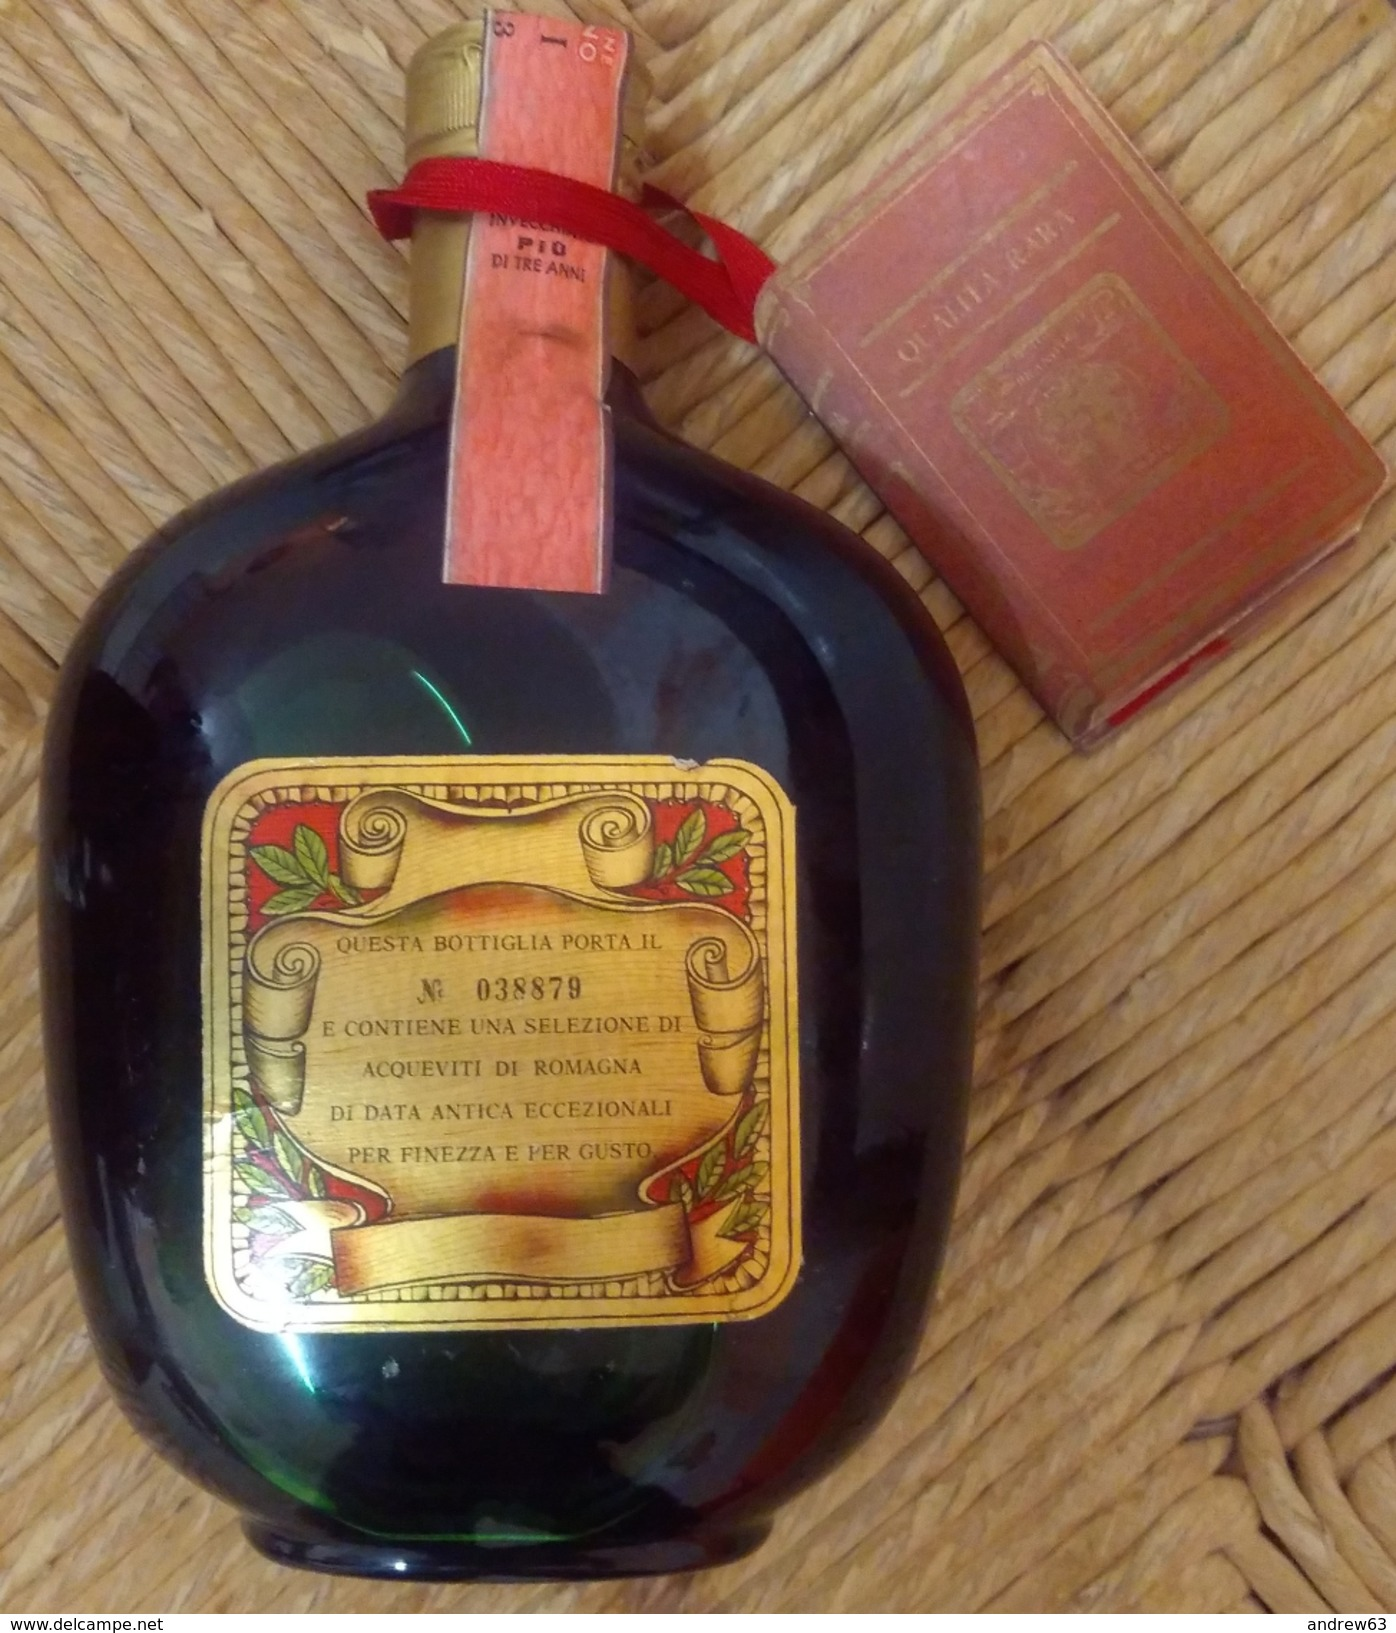 BRANDY VECCHIA ROMAGNA QUALITA' RARA GIO BUTON Lt. 0,750 Gr. 41° + BOX N° 38879 - Spirits